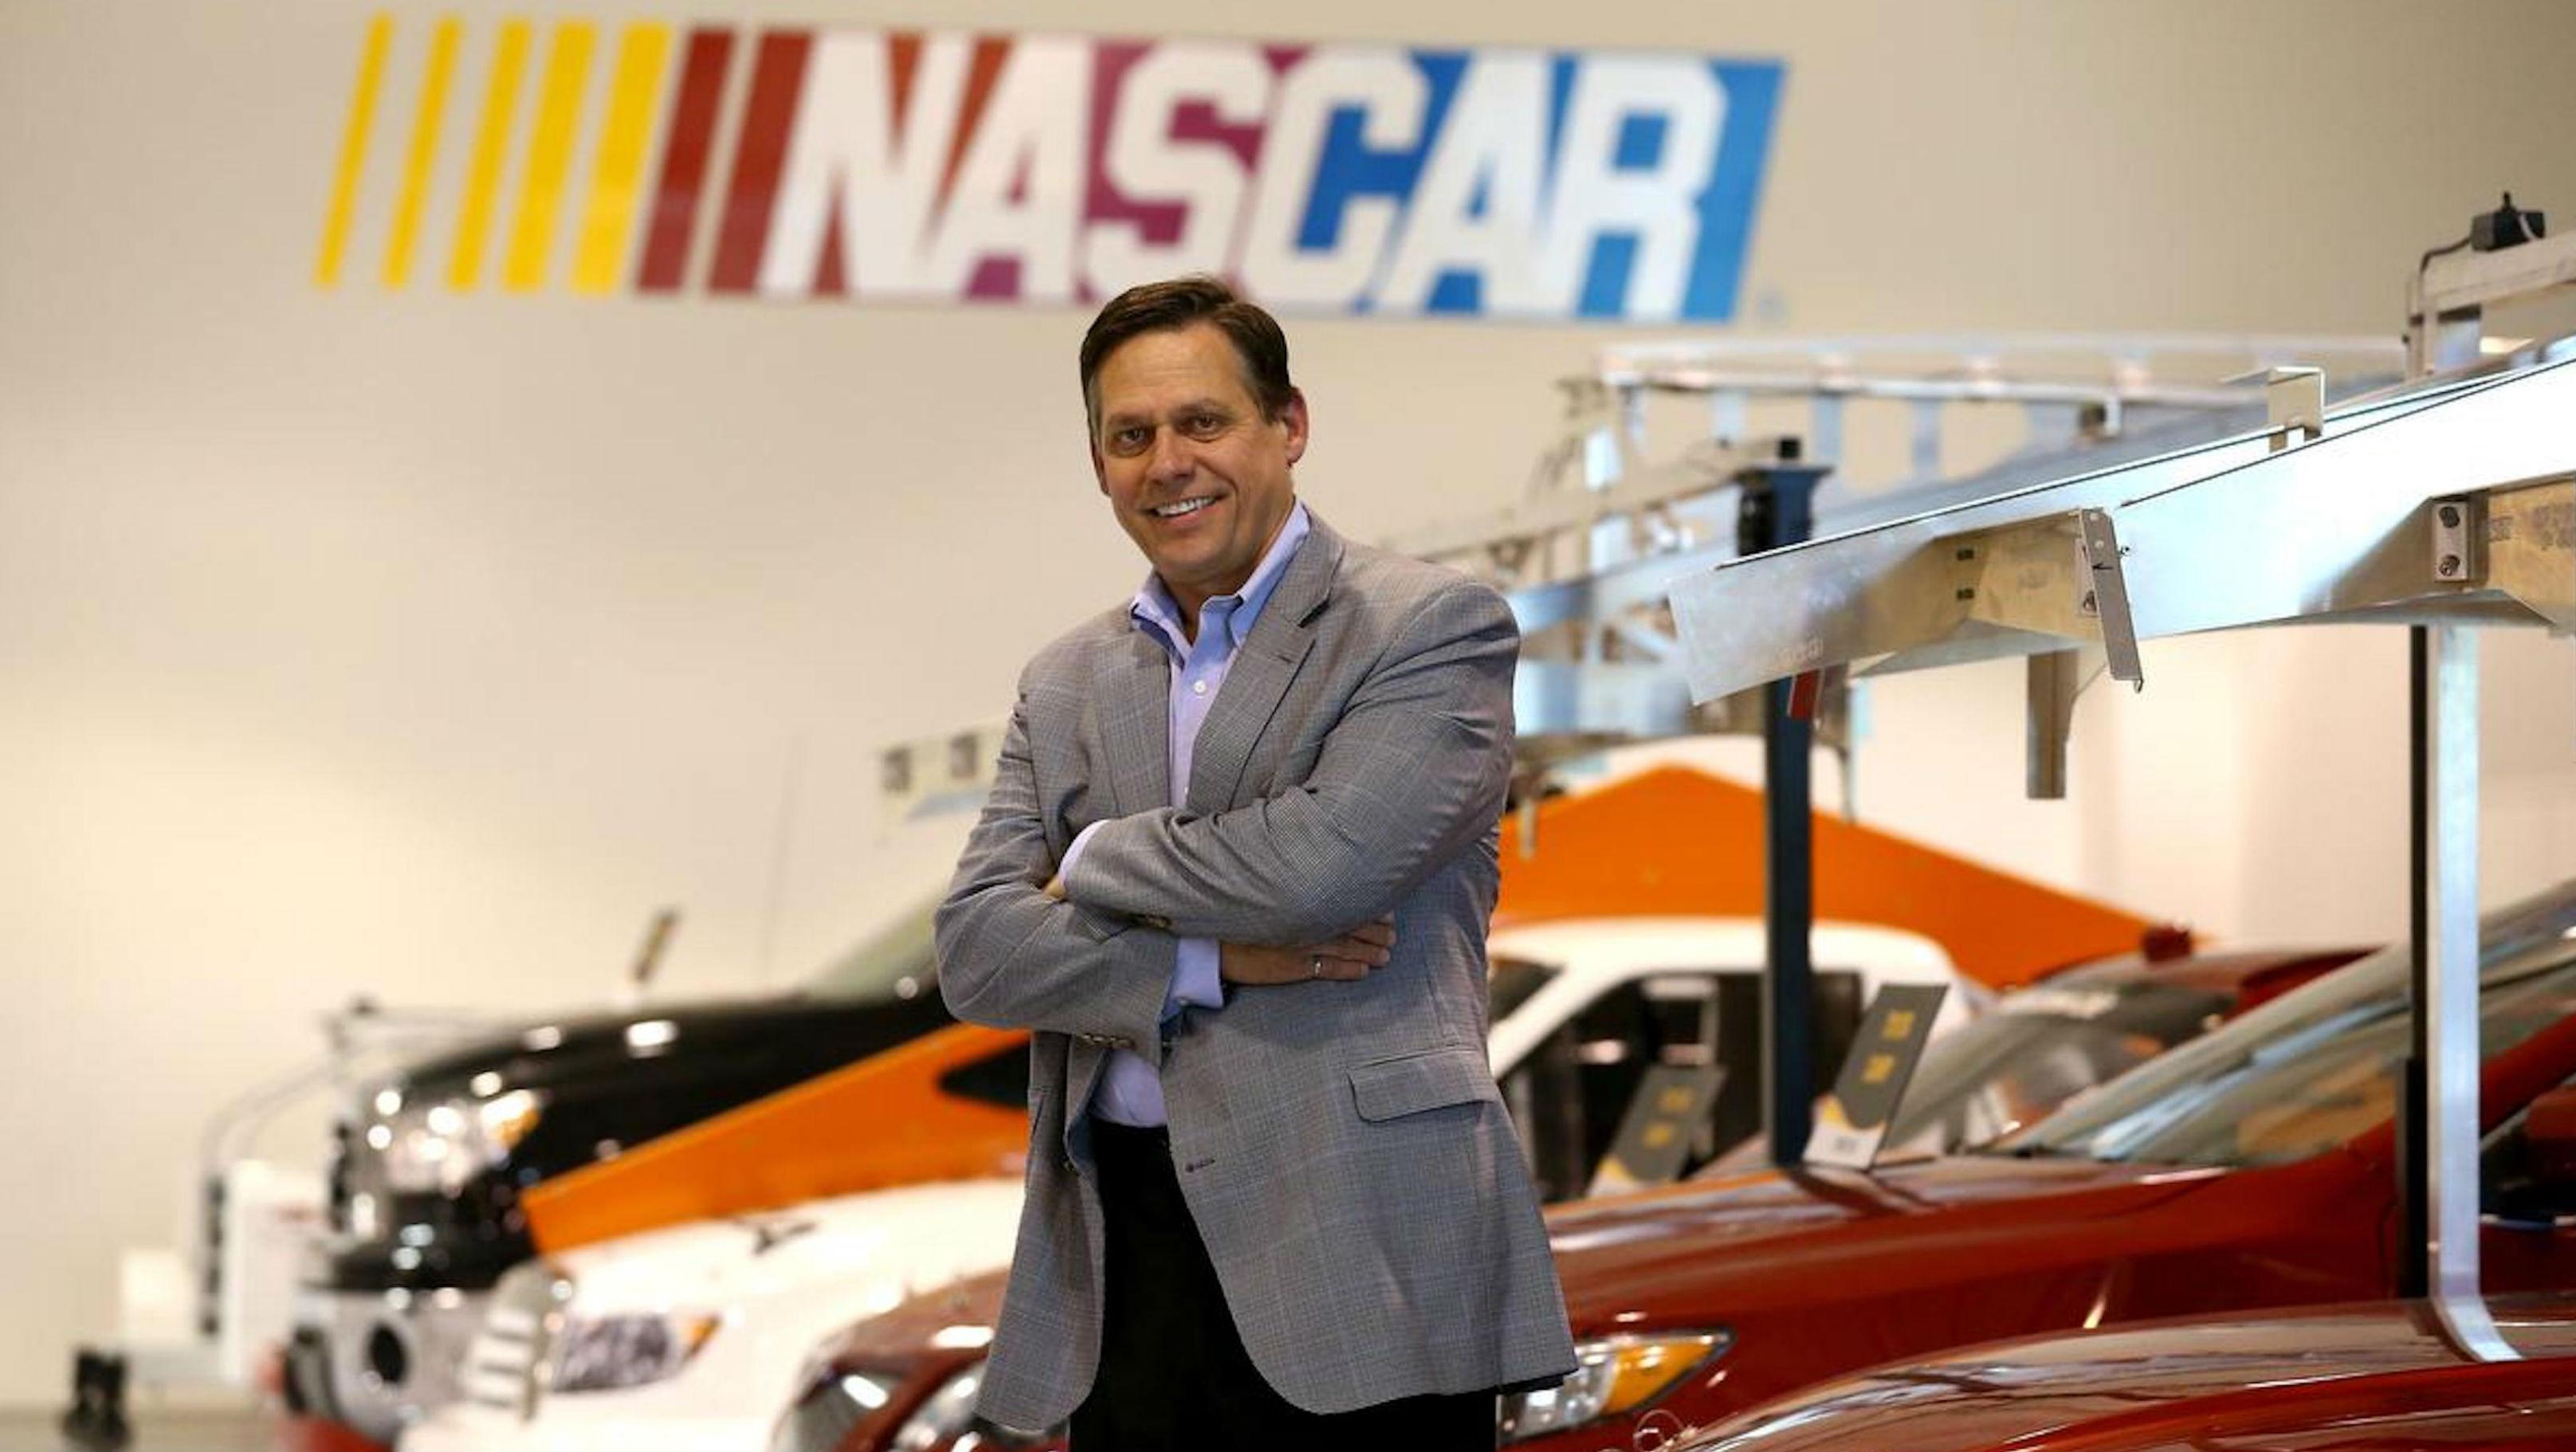 NASCAR is Expanding Internationally